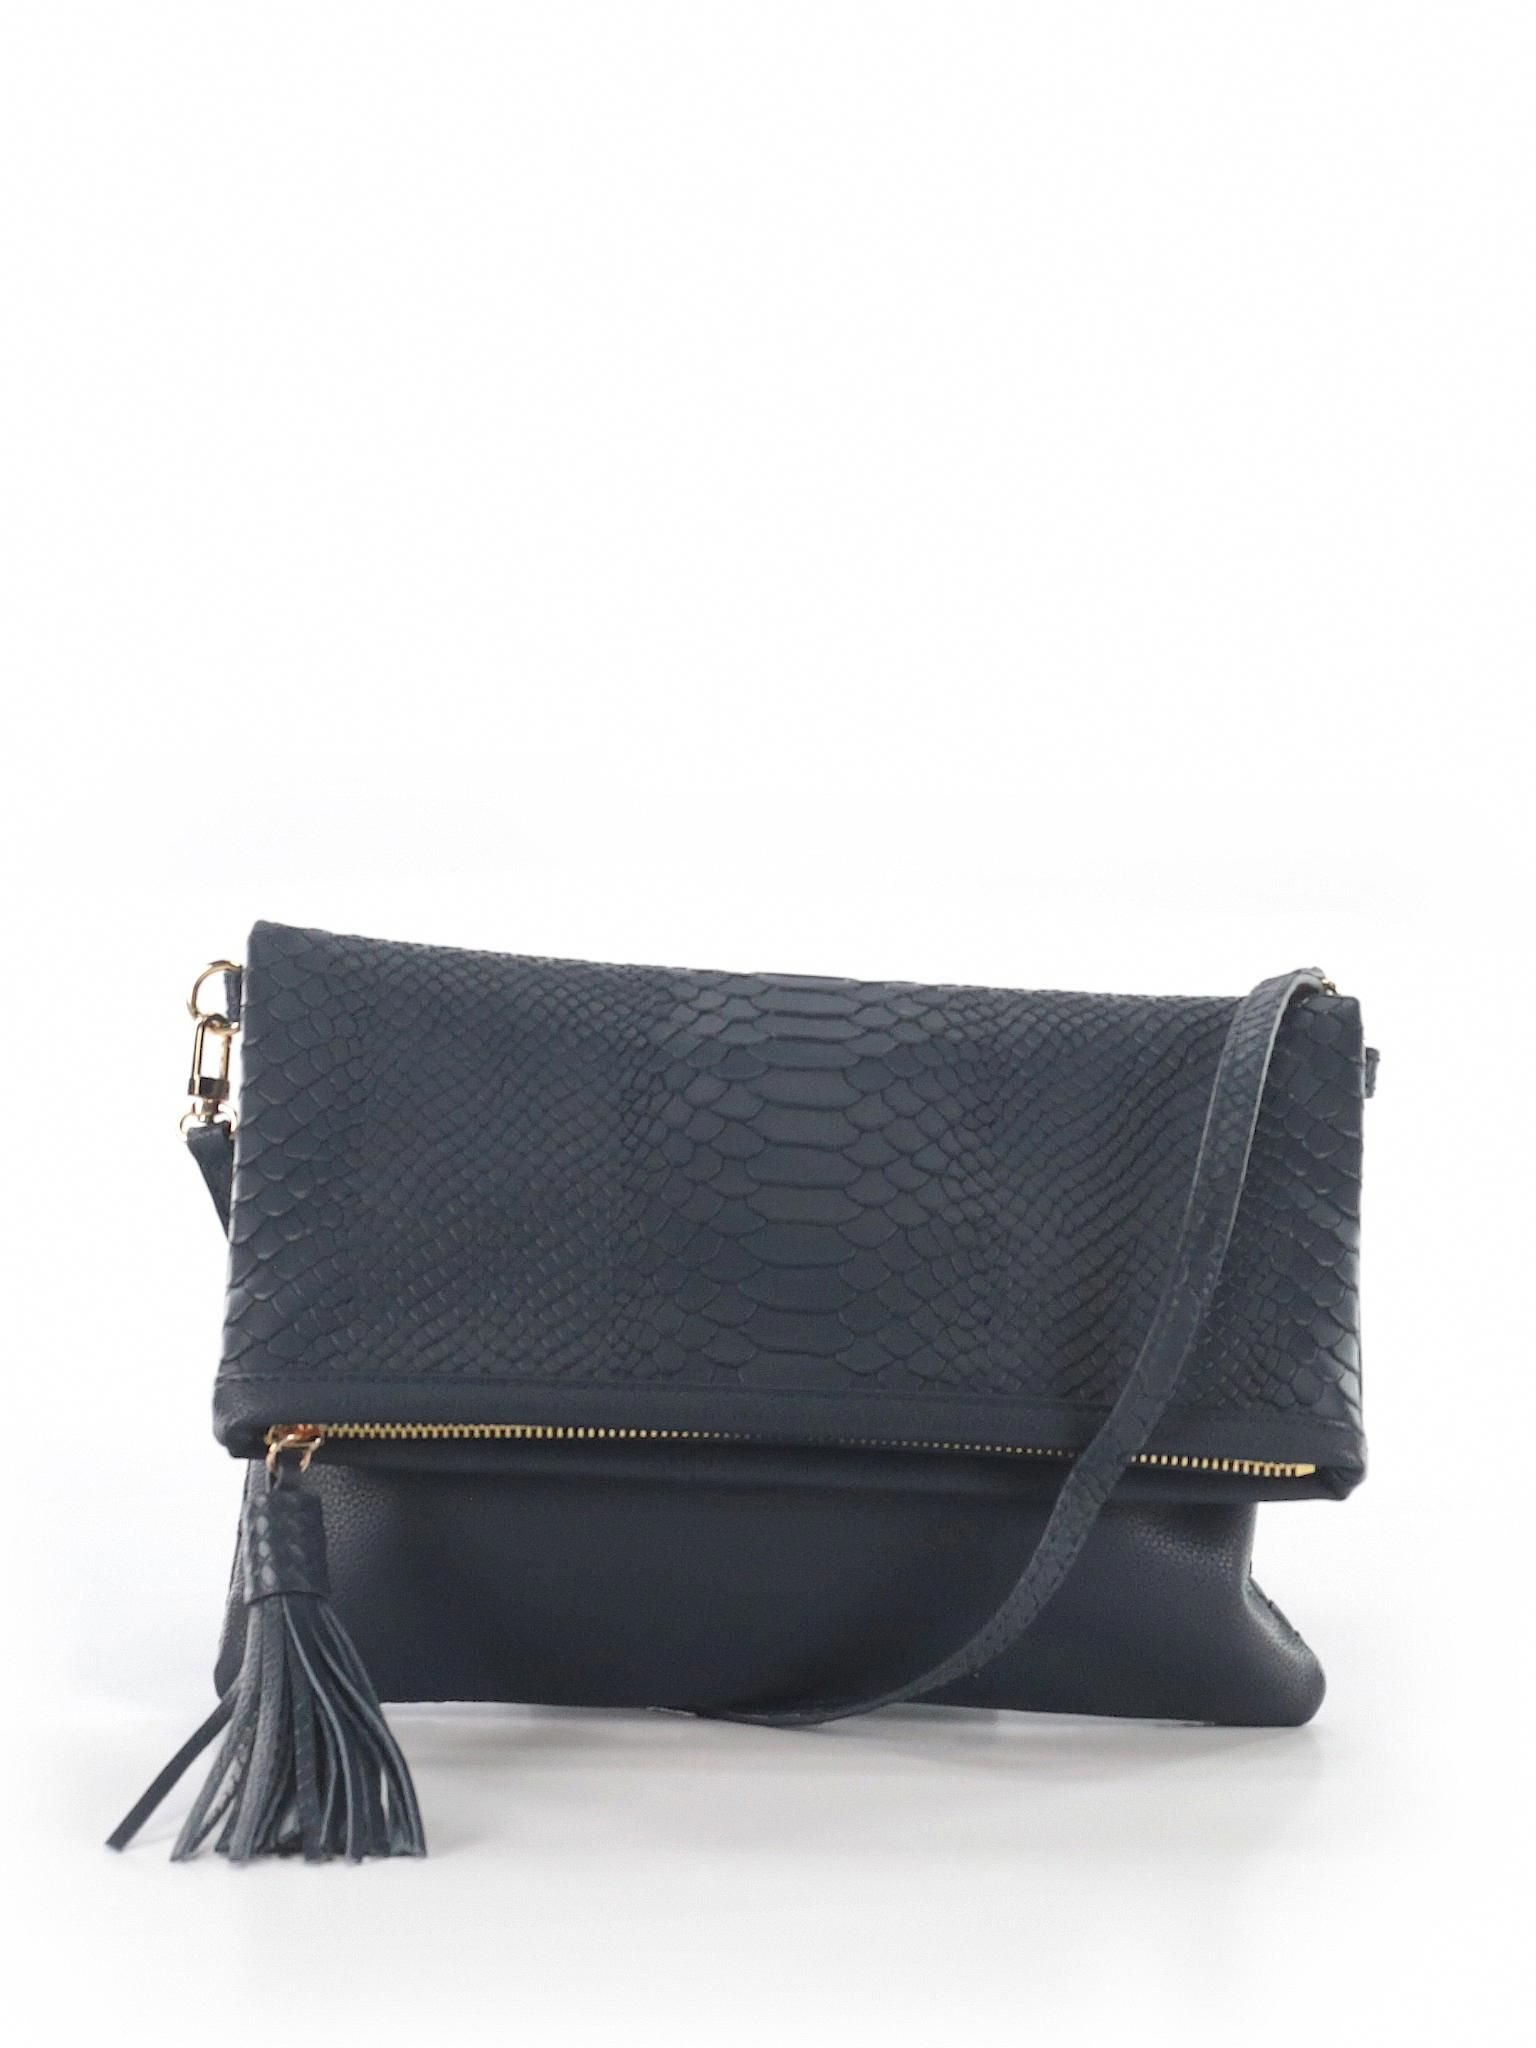 GiGi New York Crossbody Bag  Size NA Navy Blue Women s Bags -  117.99 bfbe92a827868